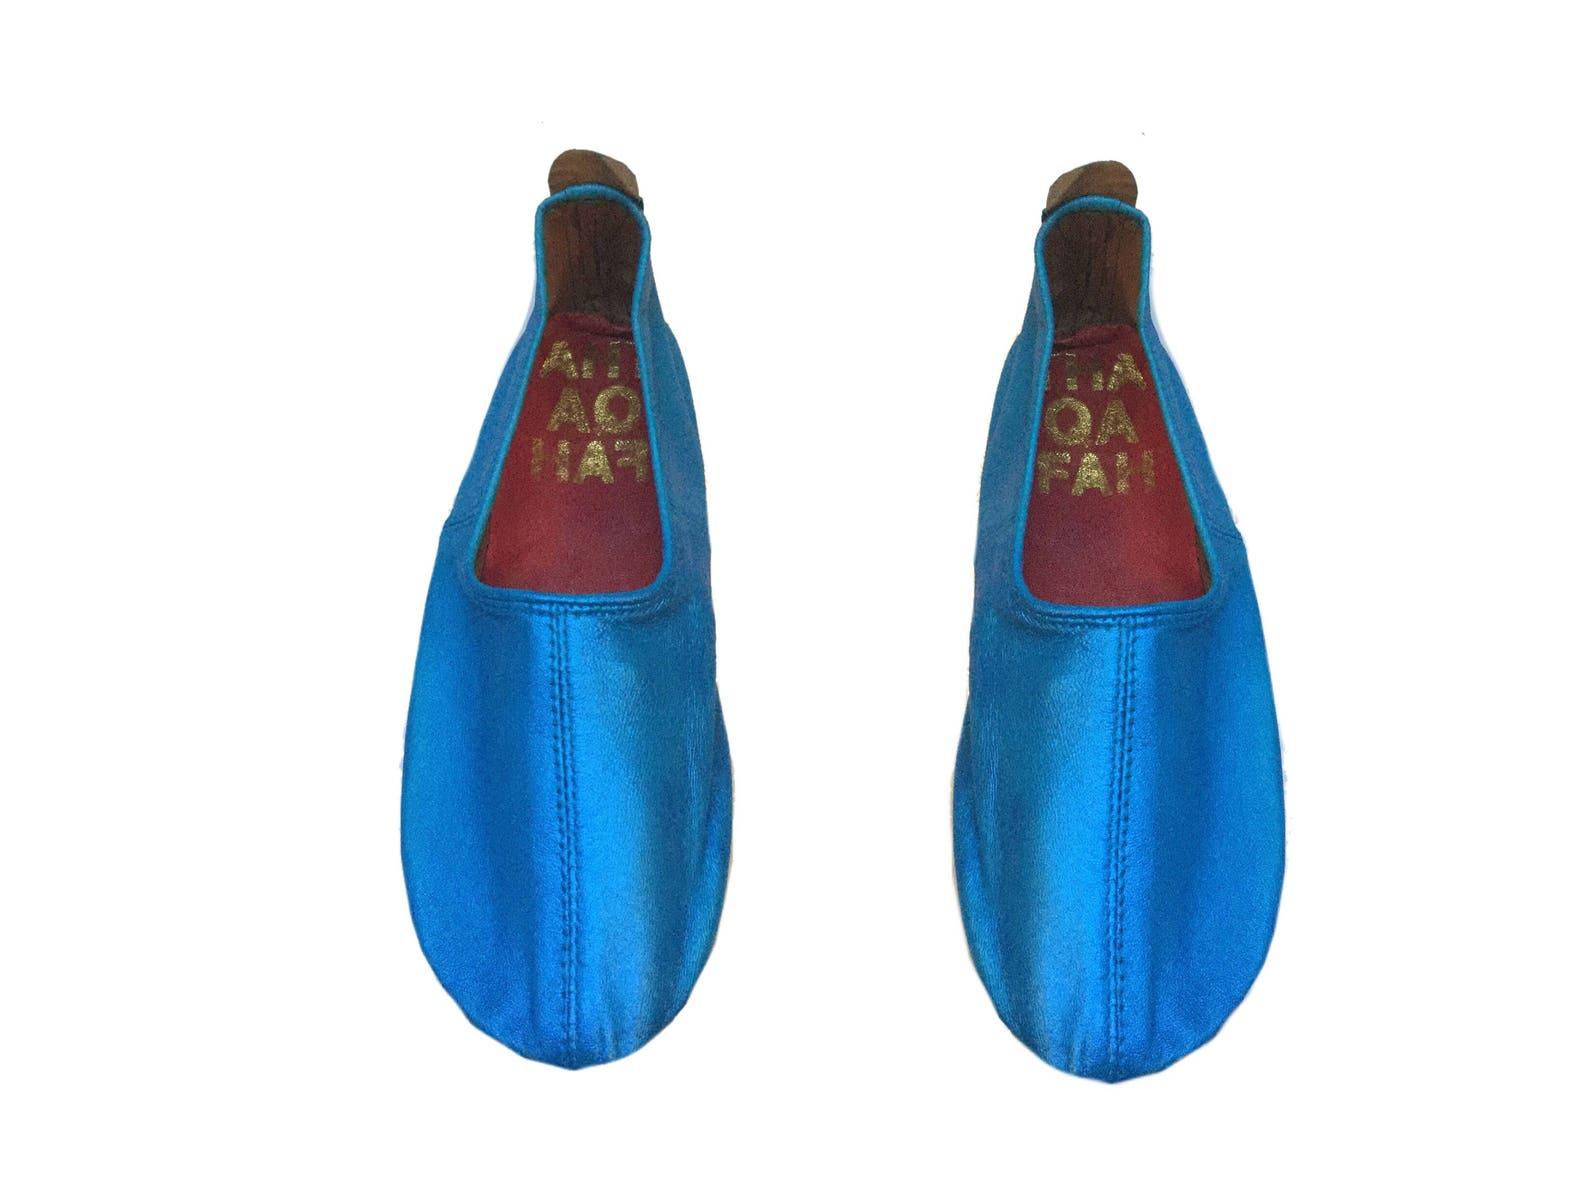 tabi socks,barefoot shoes, travel shoes,glove shoes, earthing shoes ,ballet flats, (blue metallic)